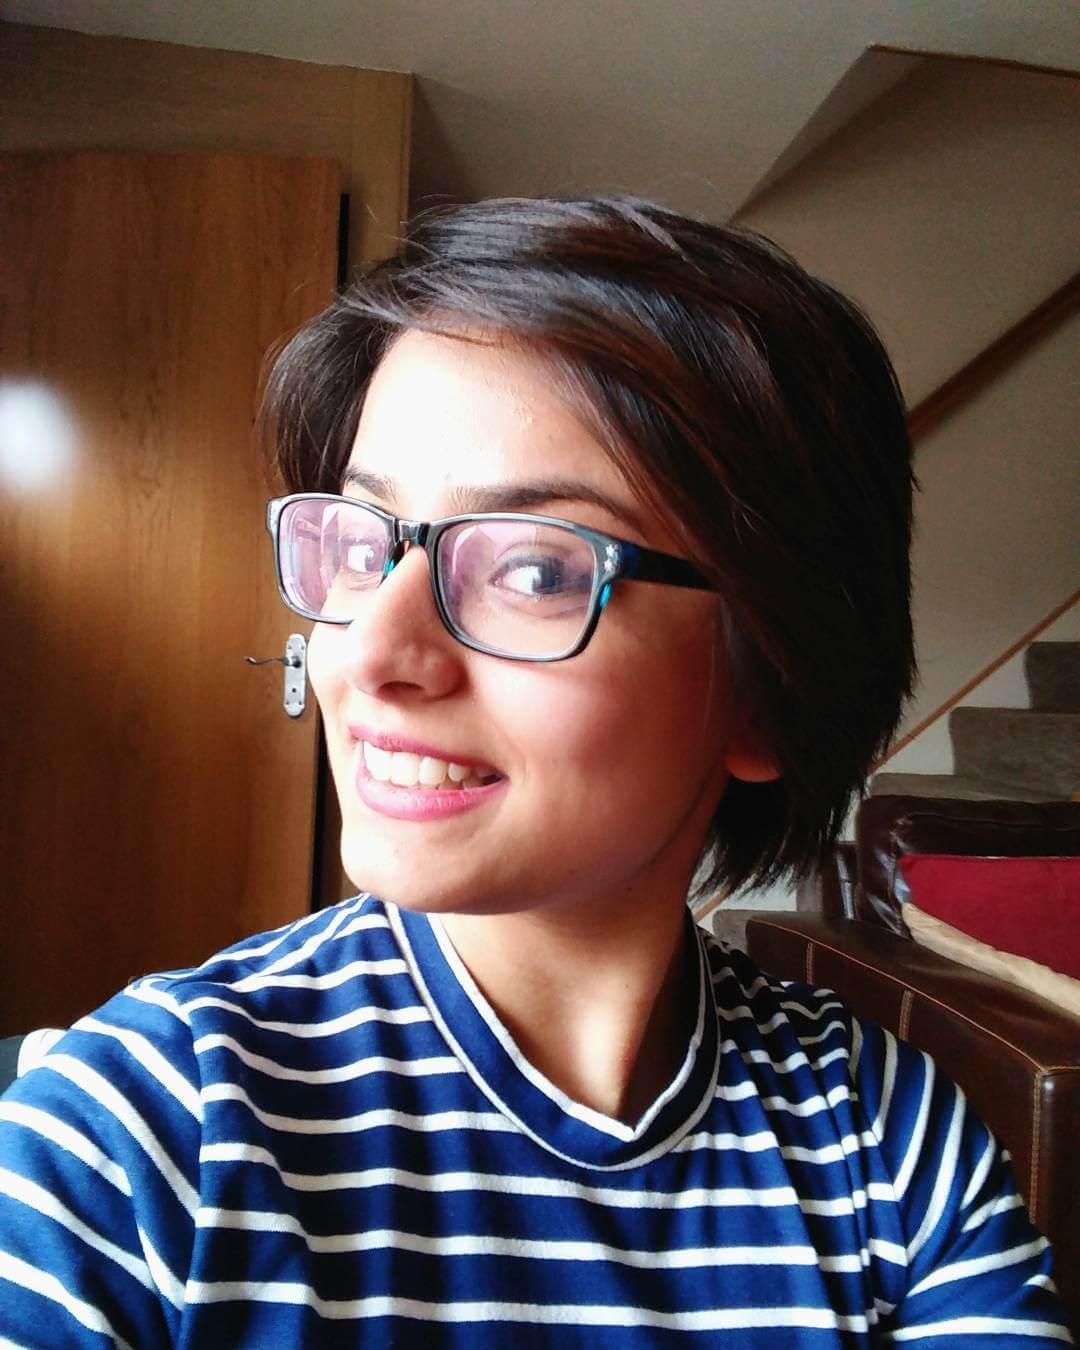 Pixie Haircuts (1)